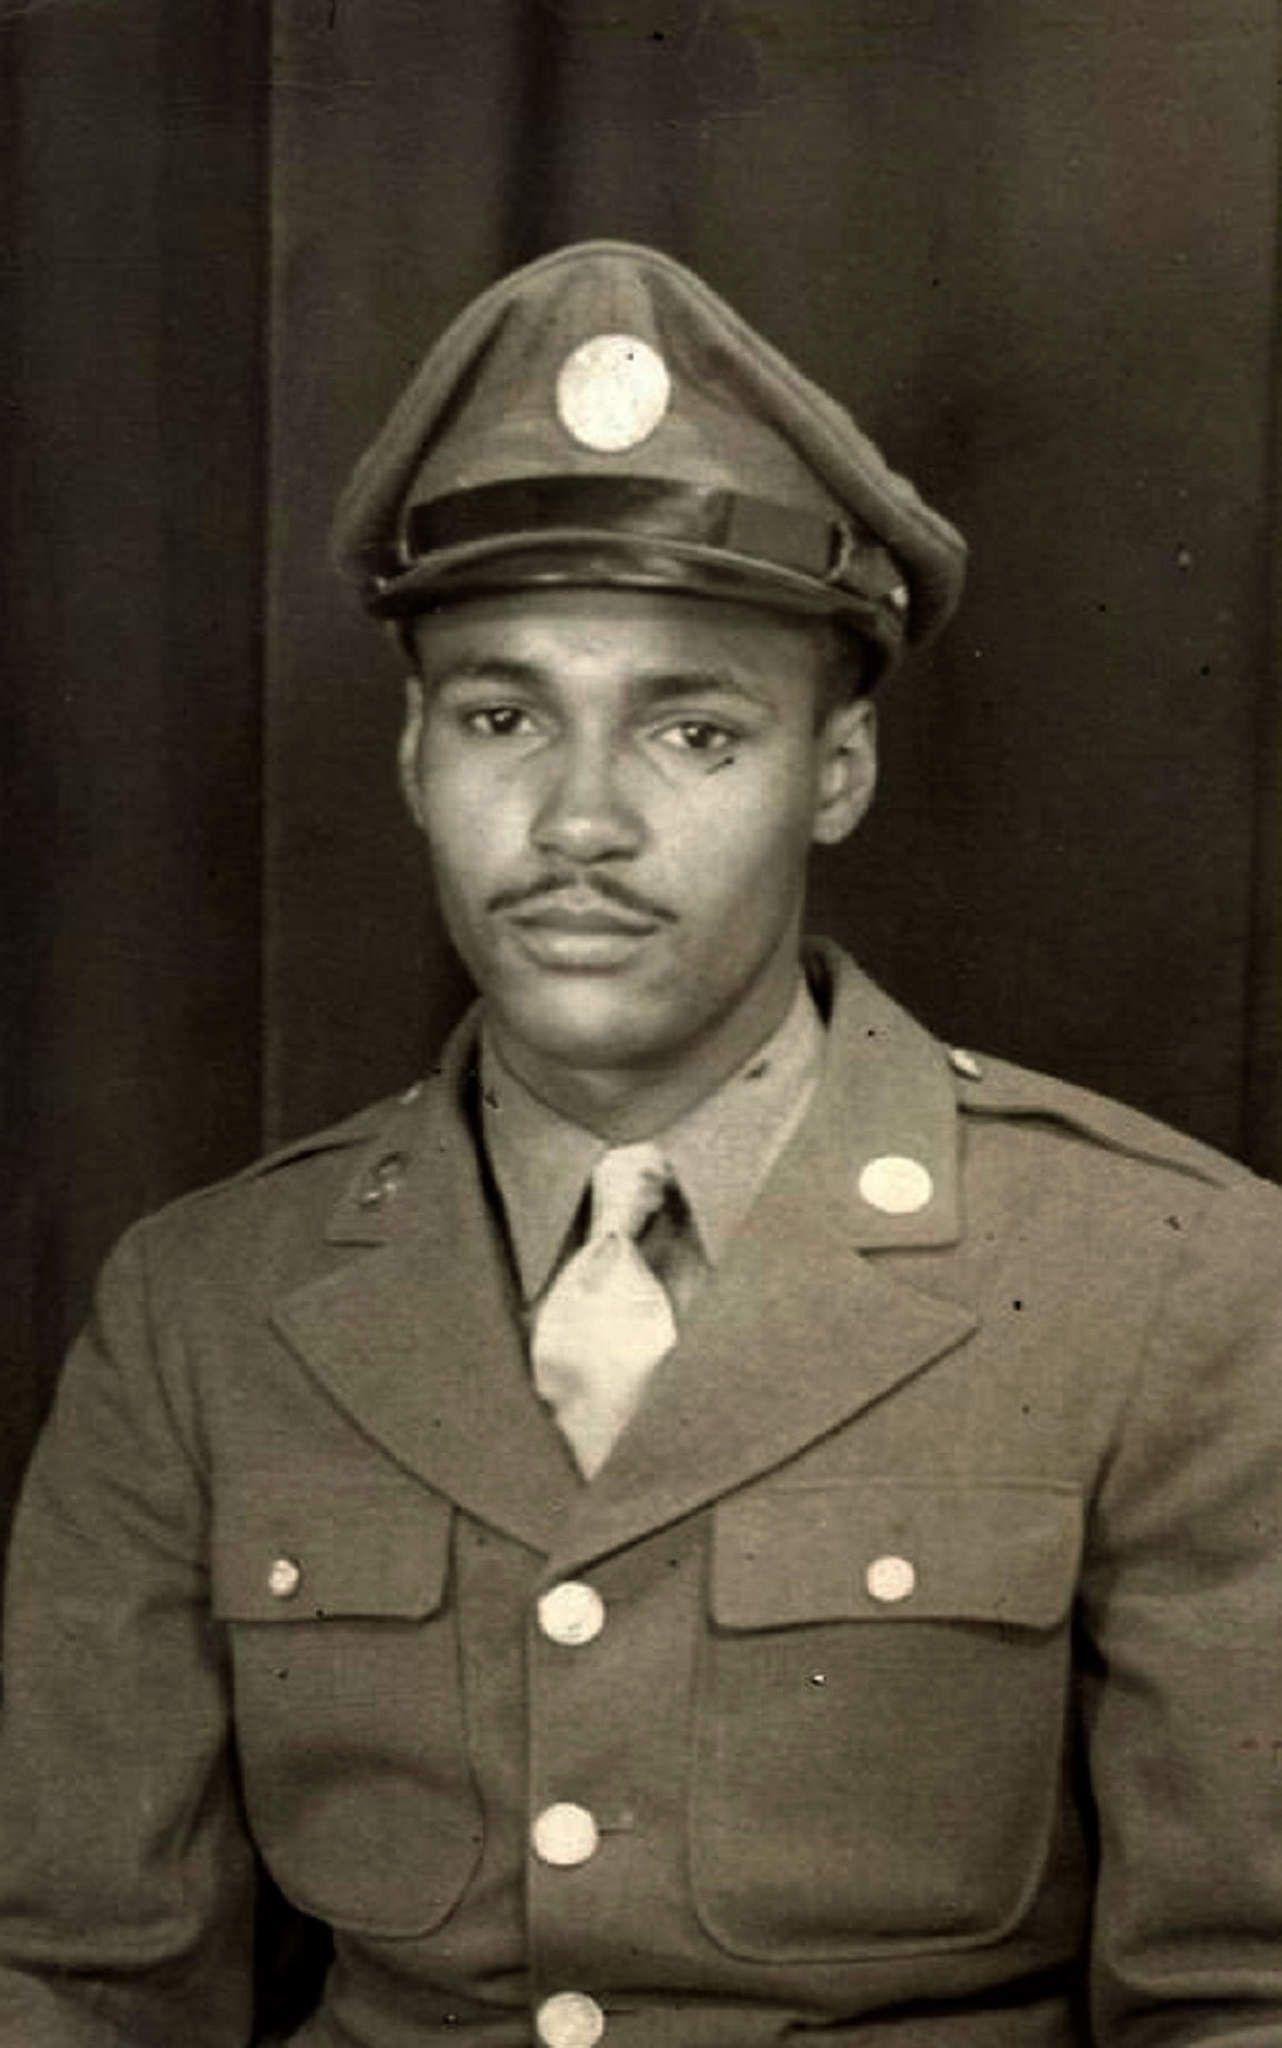 Woodrow American soldiers, African american history